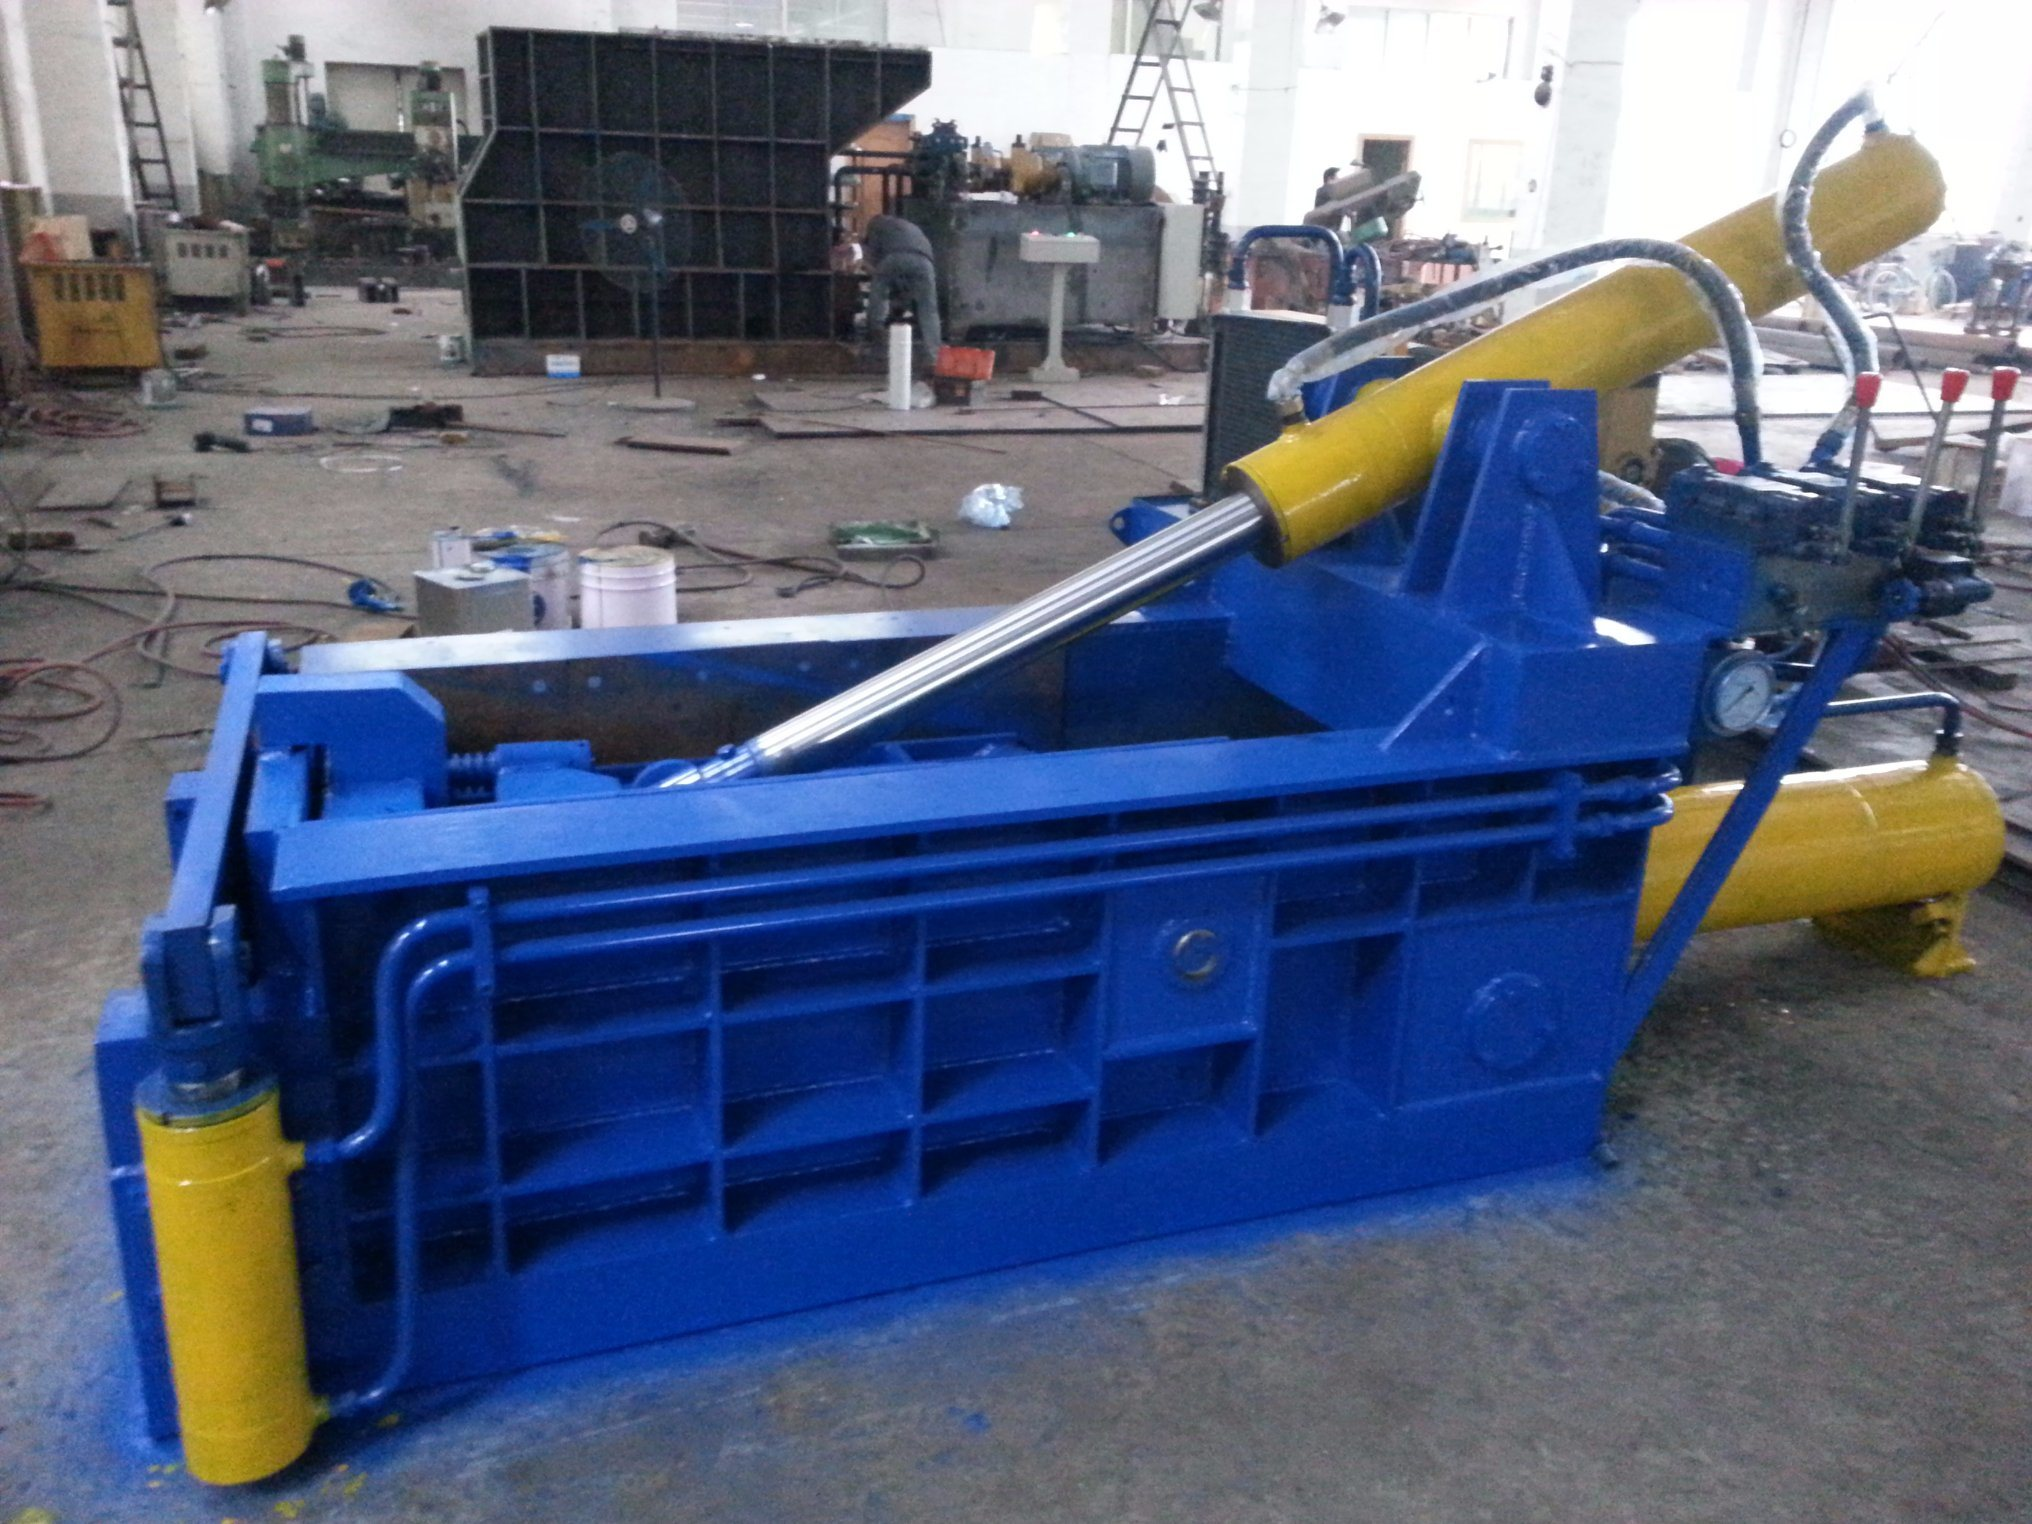 2017 Newest Horizontal Hydraulic Scrap Metal Baler/Compactor/Baling Machine